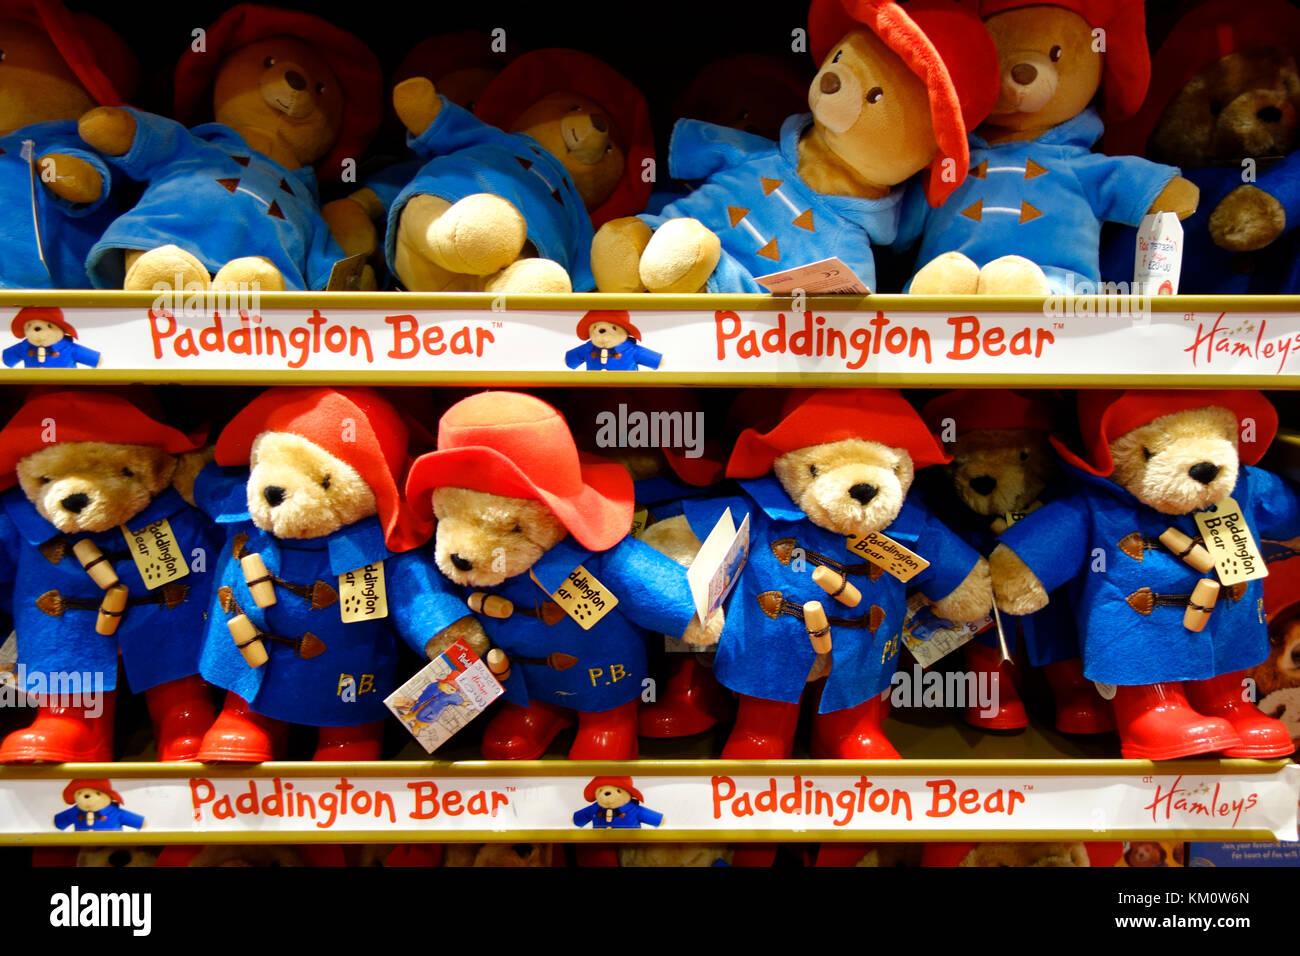 Paddington Bär Spielzeug auf Regalen in Hamleys Toy Shop, Regent Street, London Stockfoto